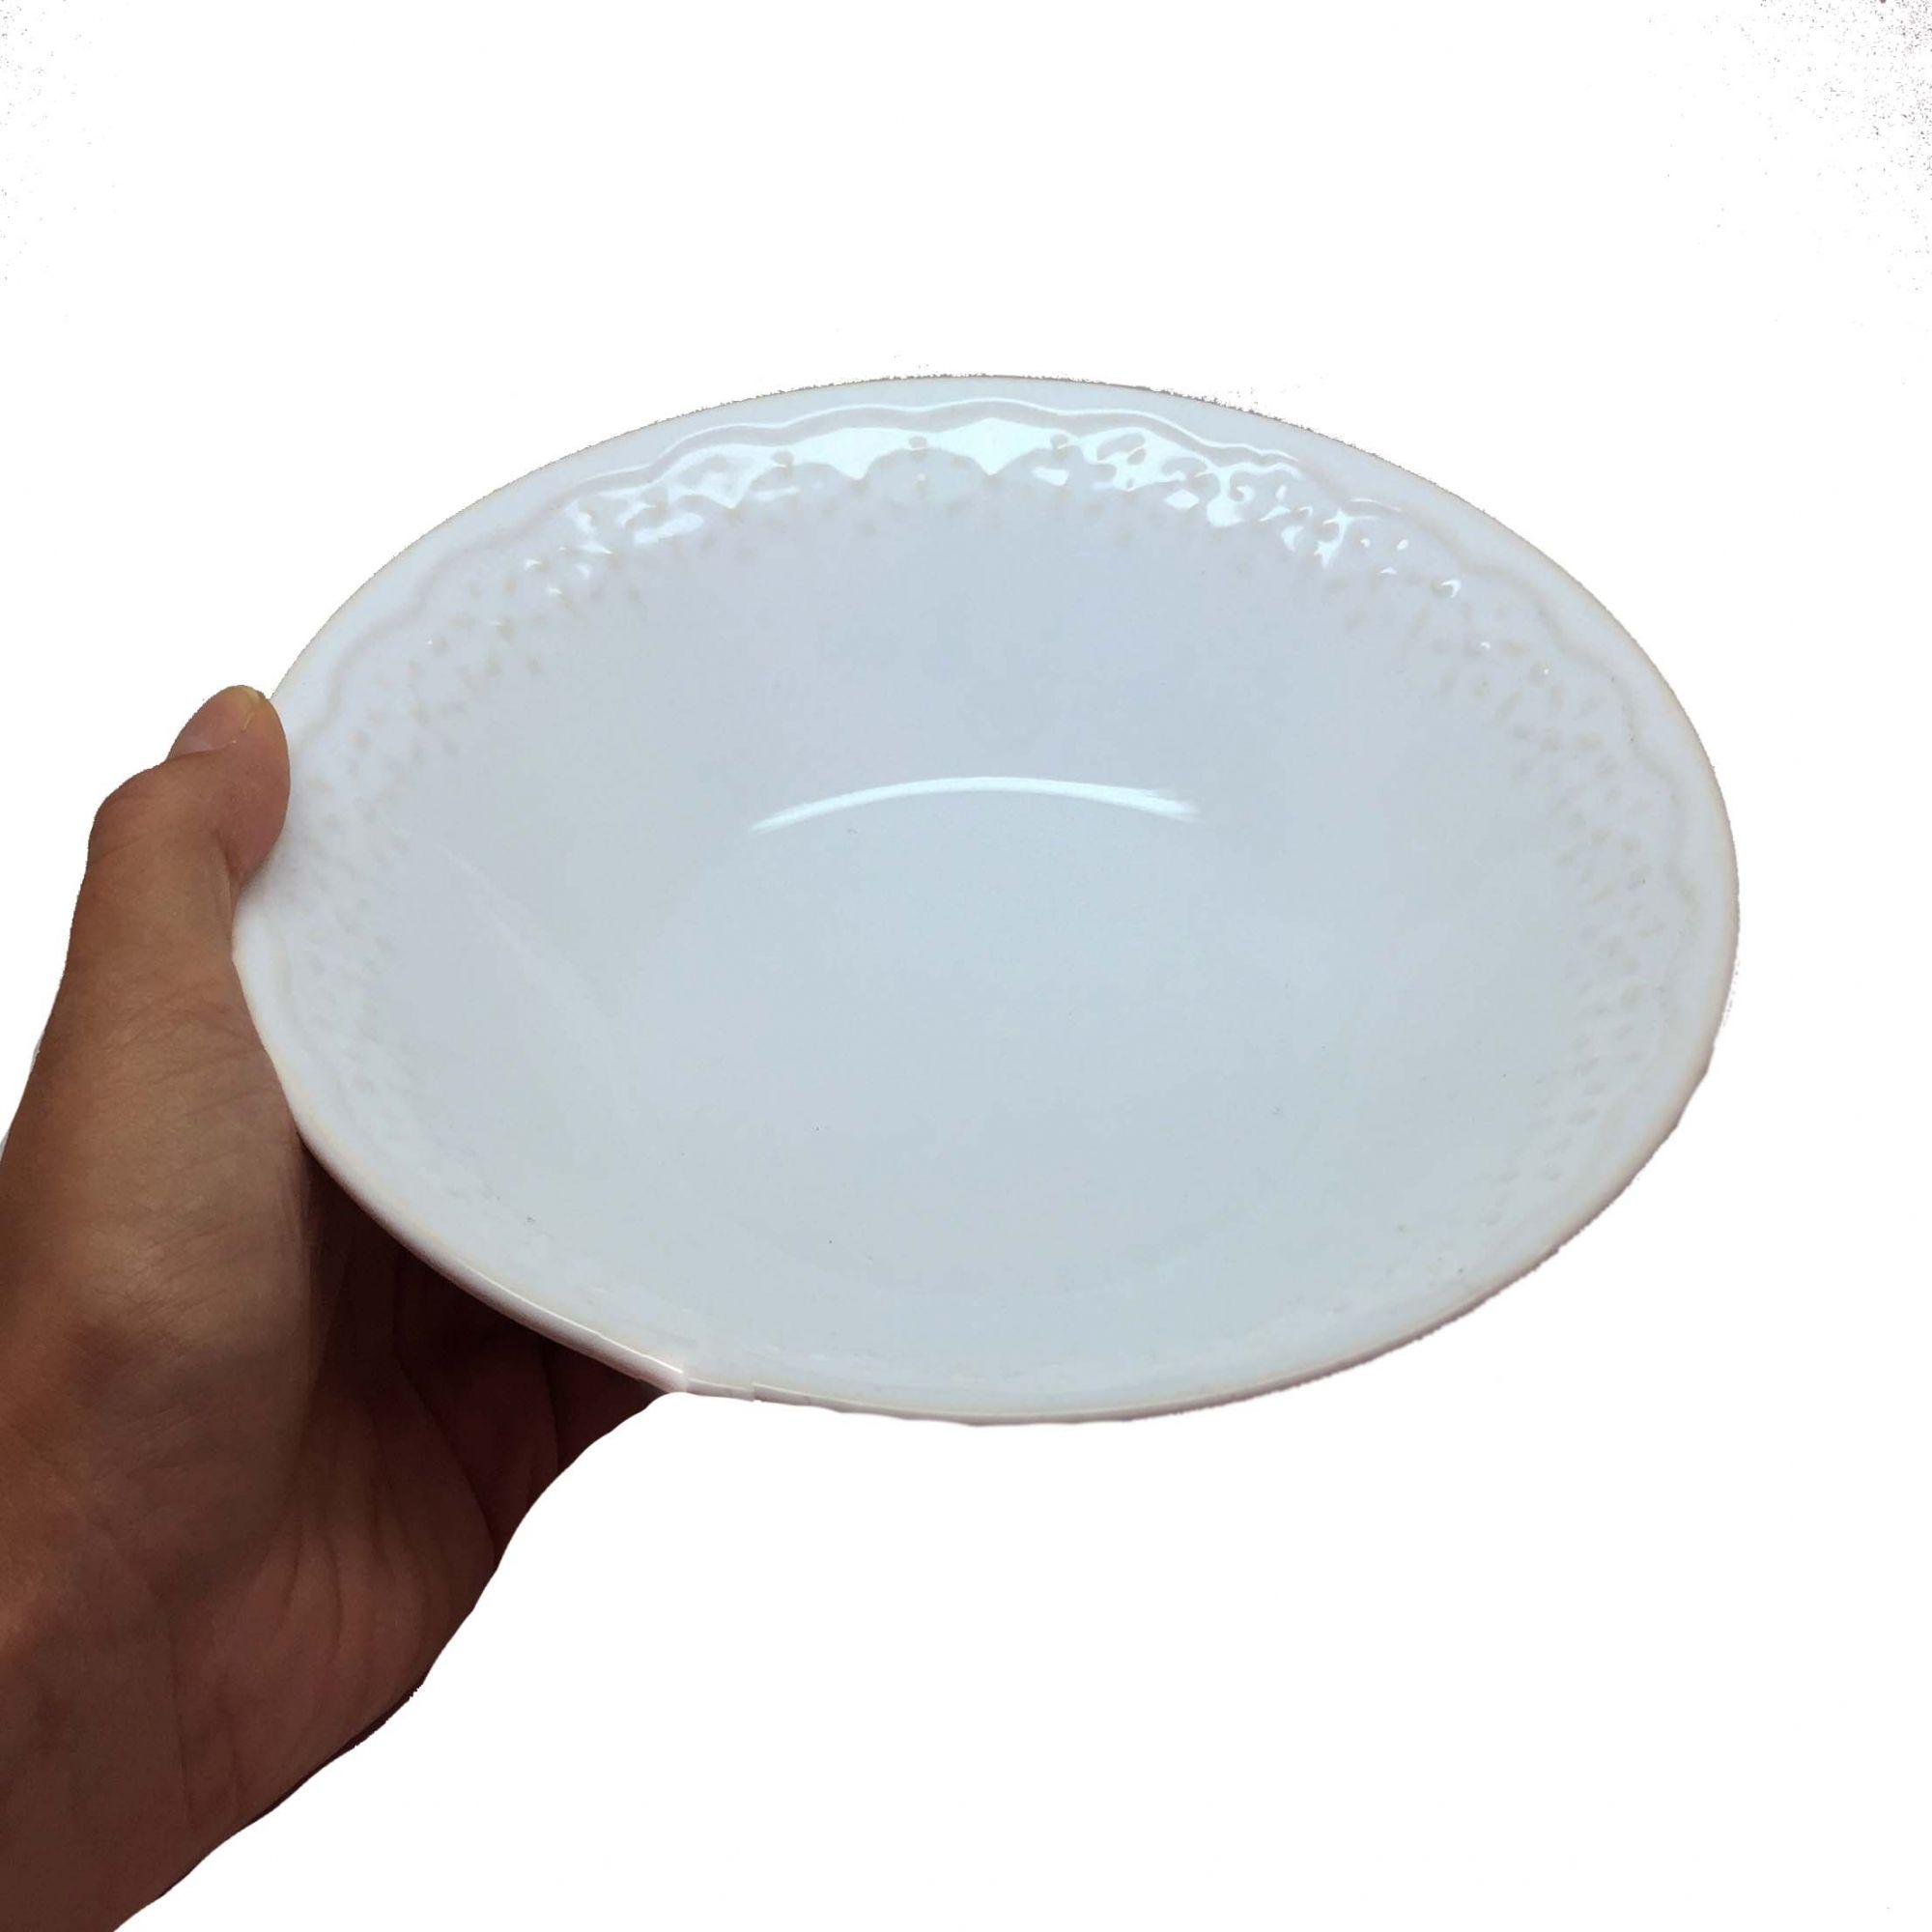 Tigela de Cerâmica Branco Clássico Grande